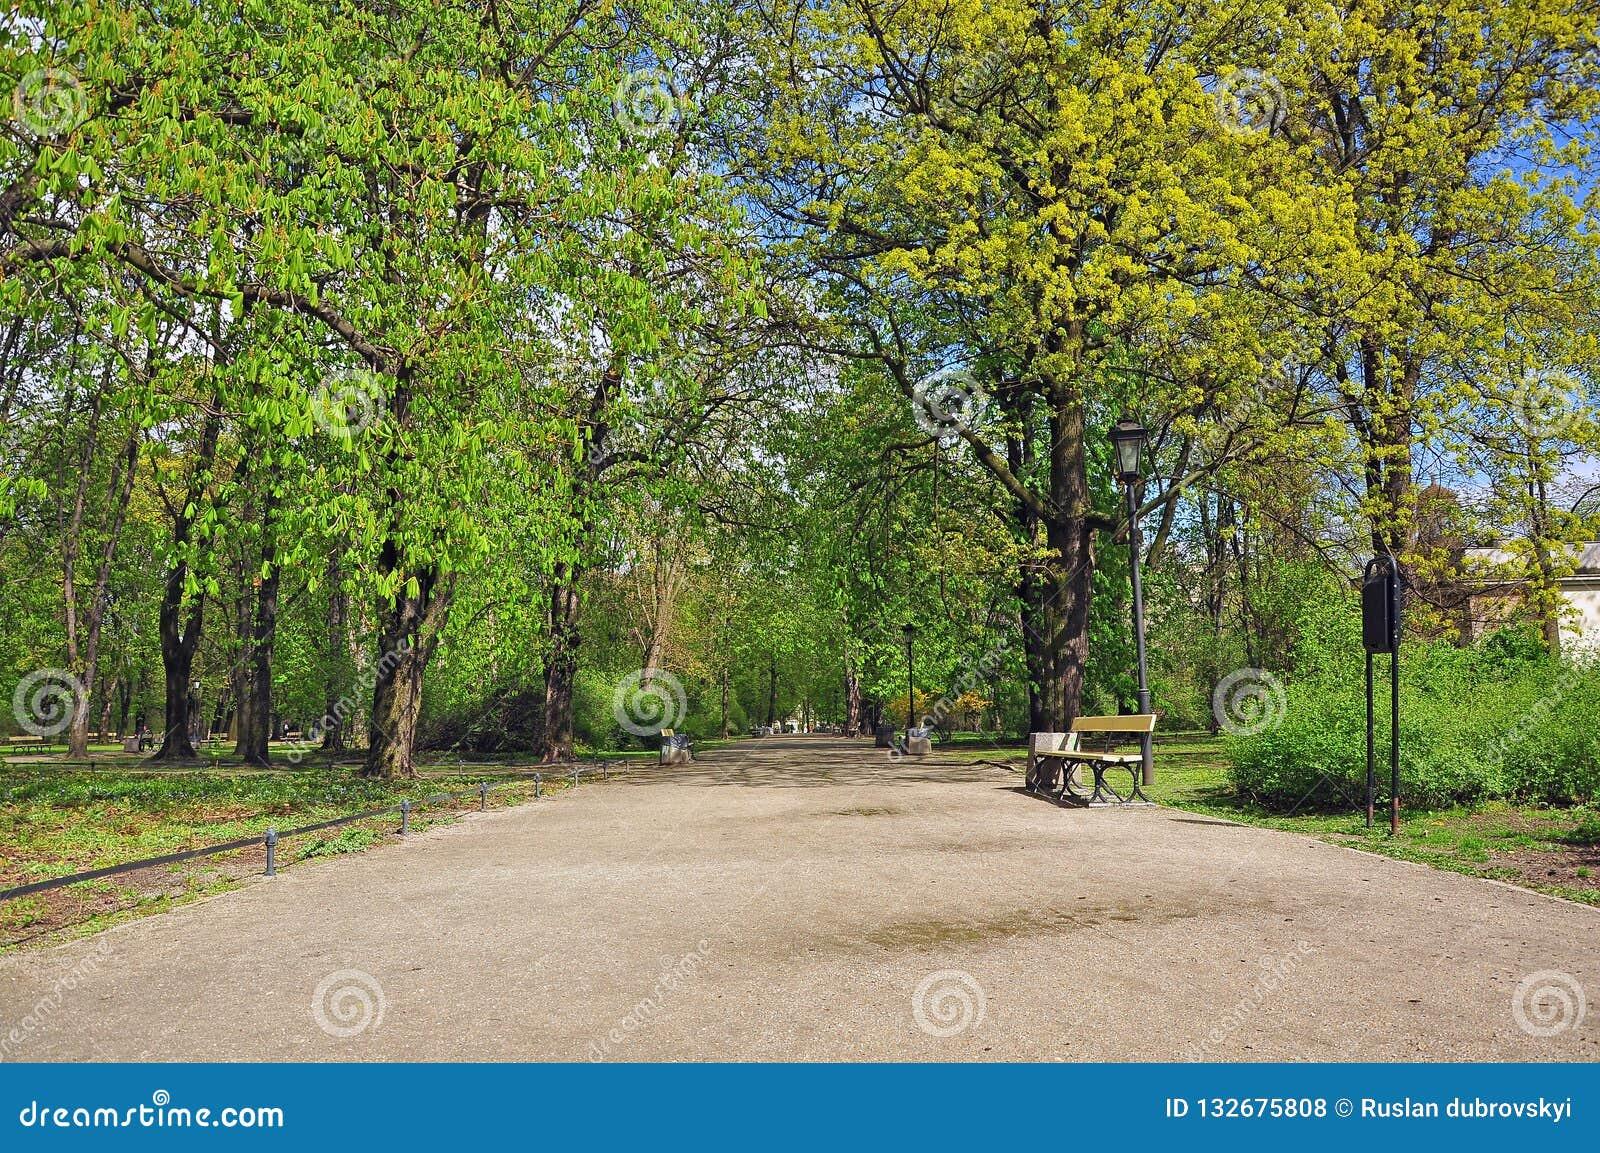 Walk in the spring park.